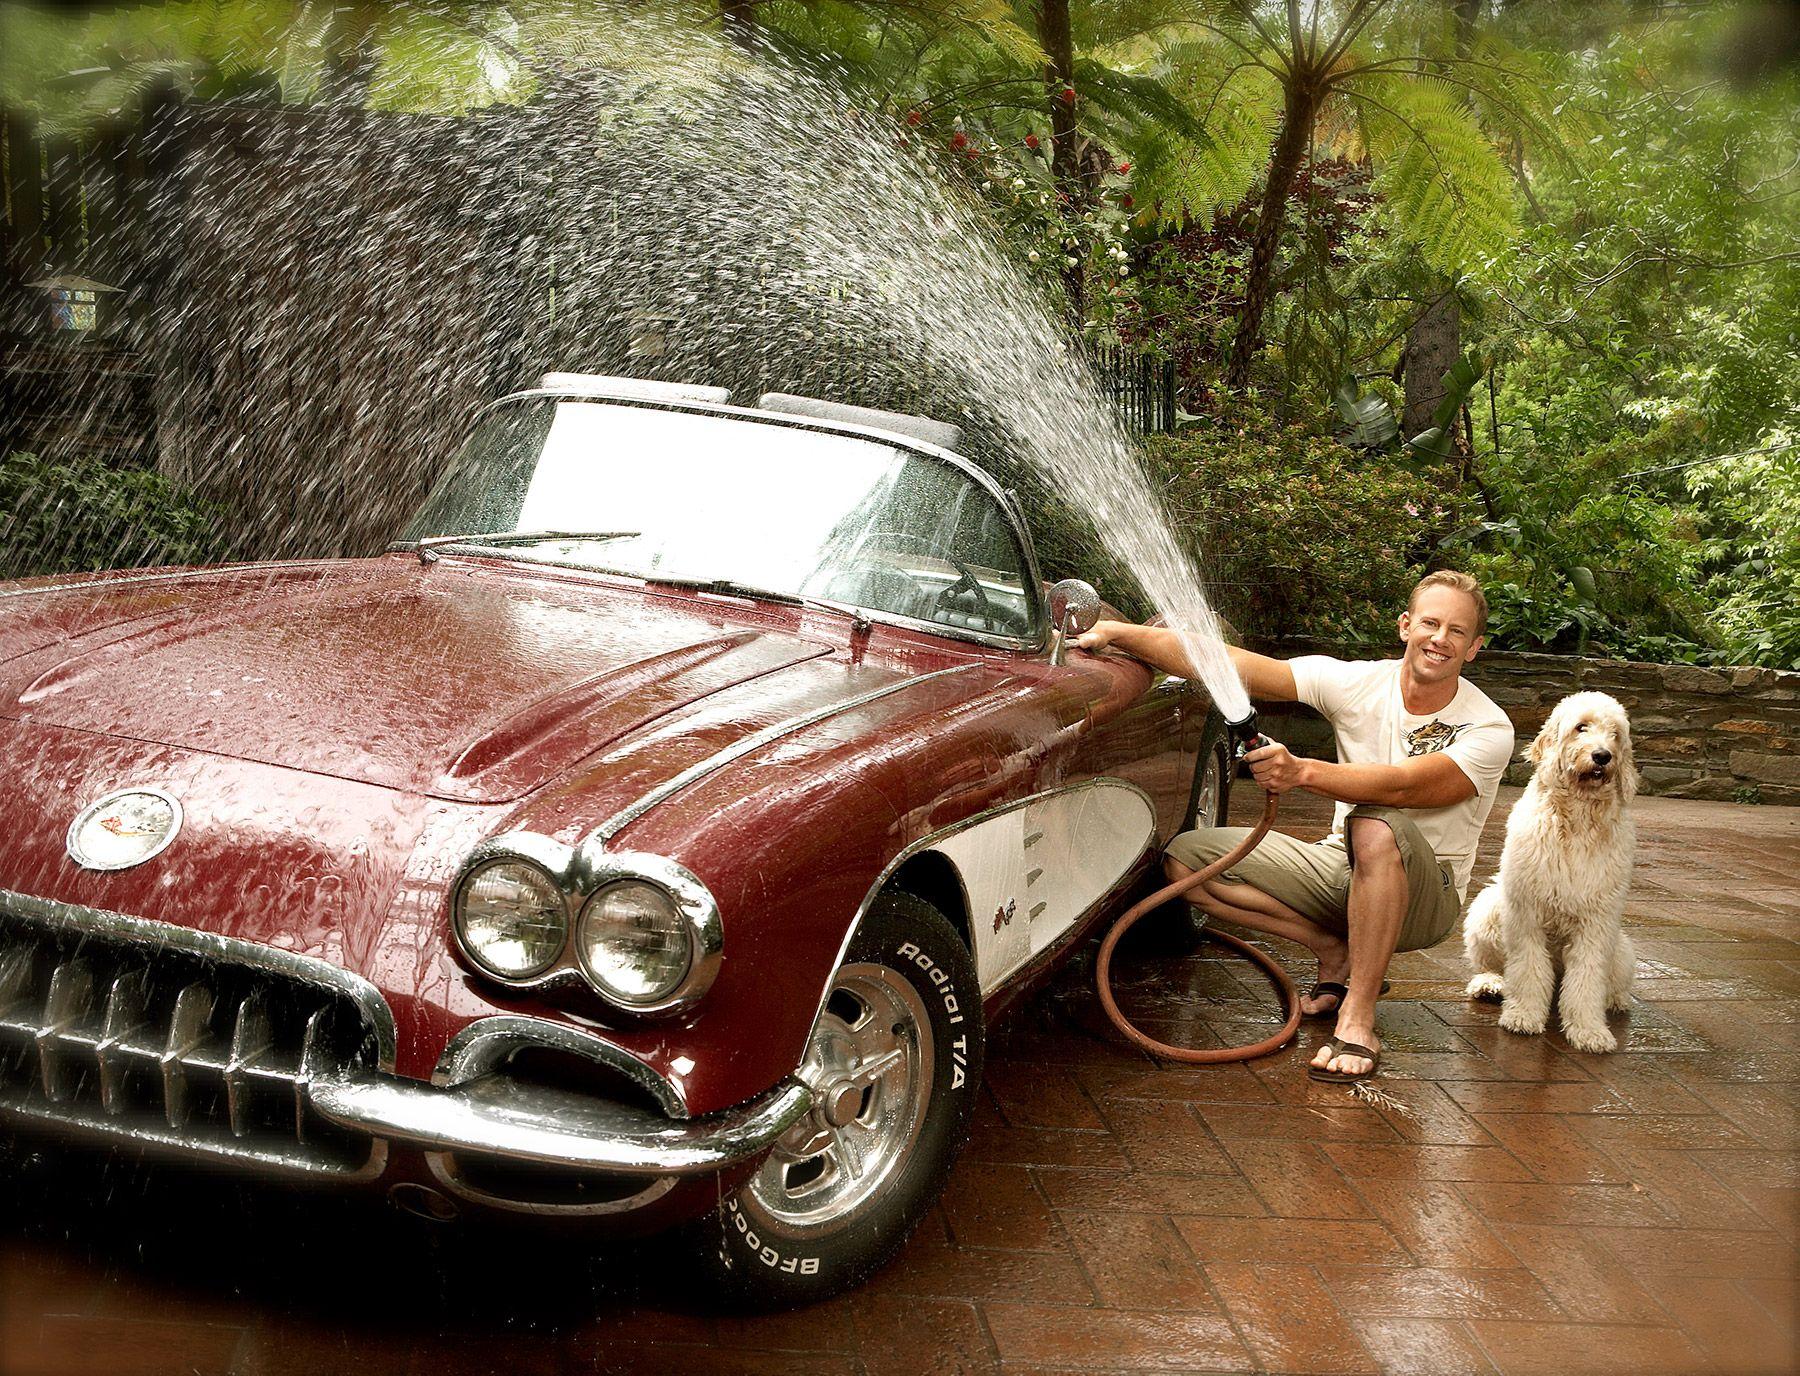 ian carwash.jpg